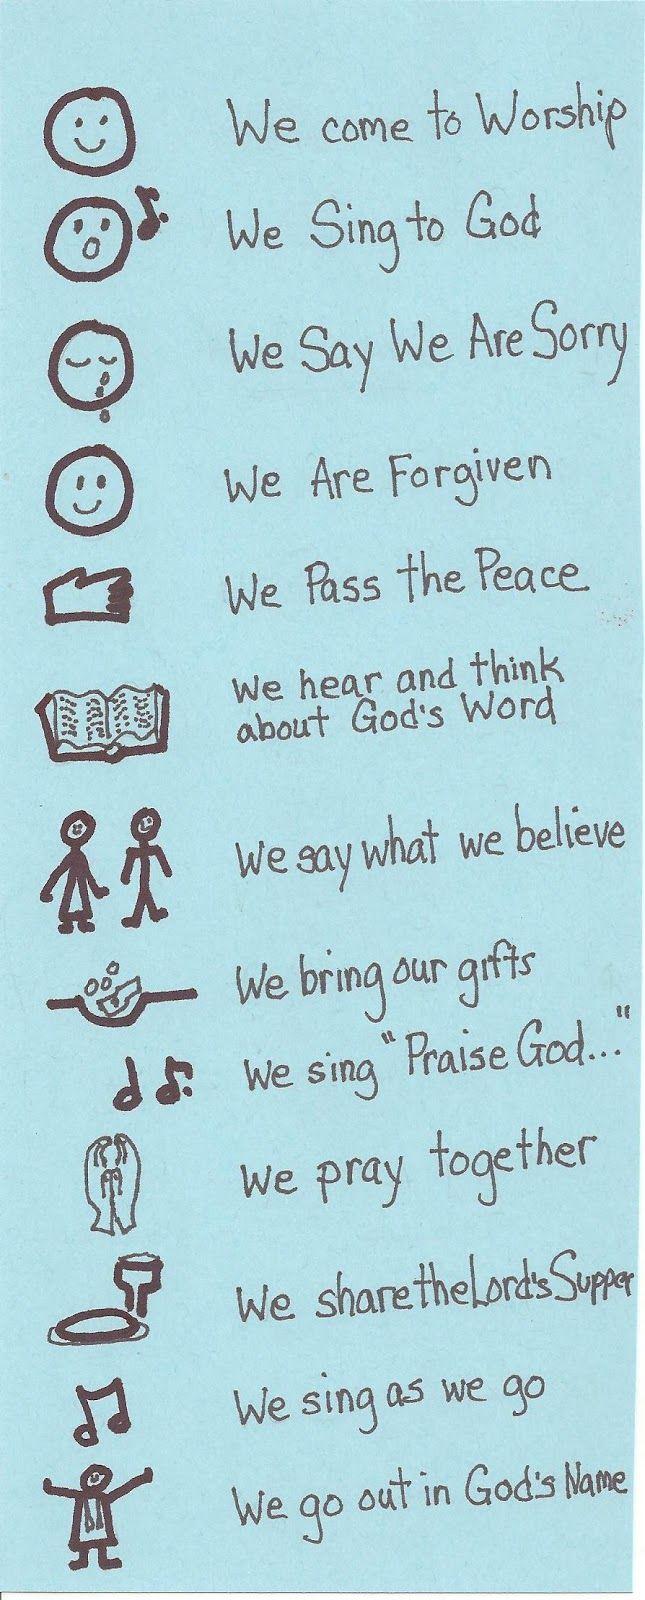 Worshiping With Children: Creating Children's Bulletins That Draw Children Into Worship